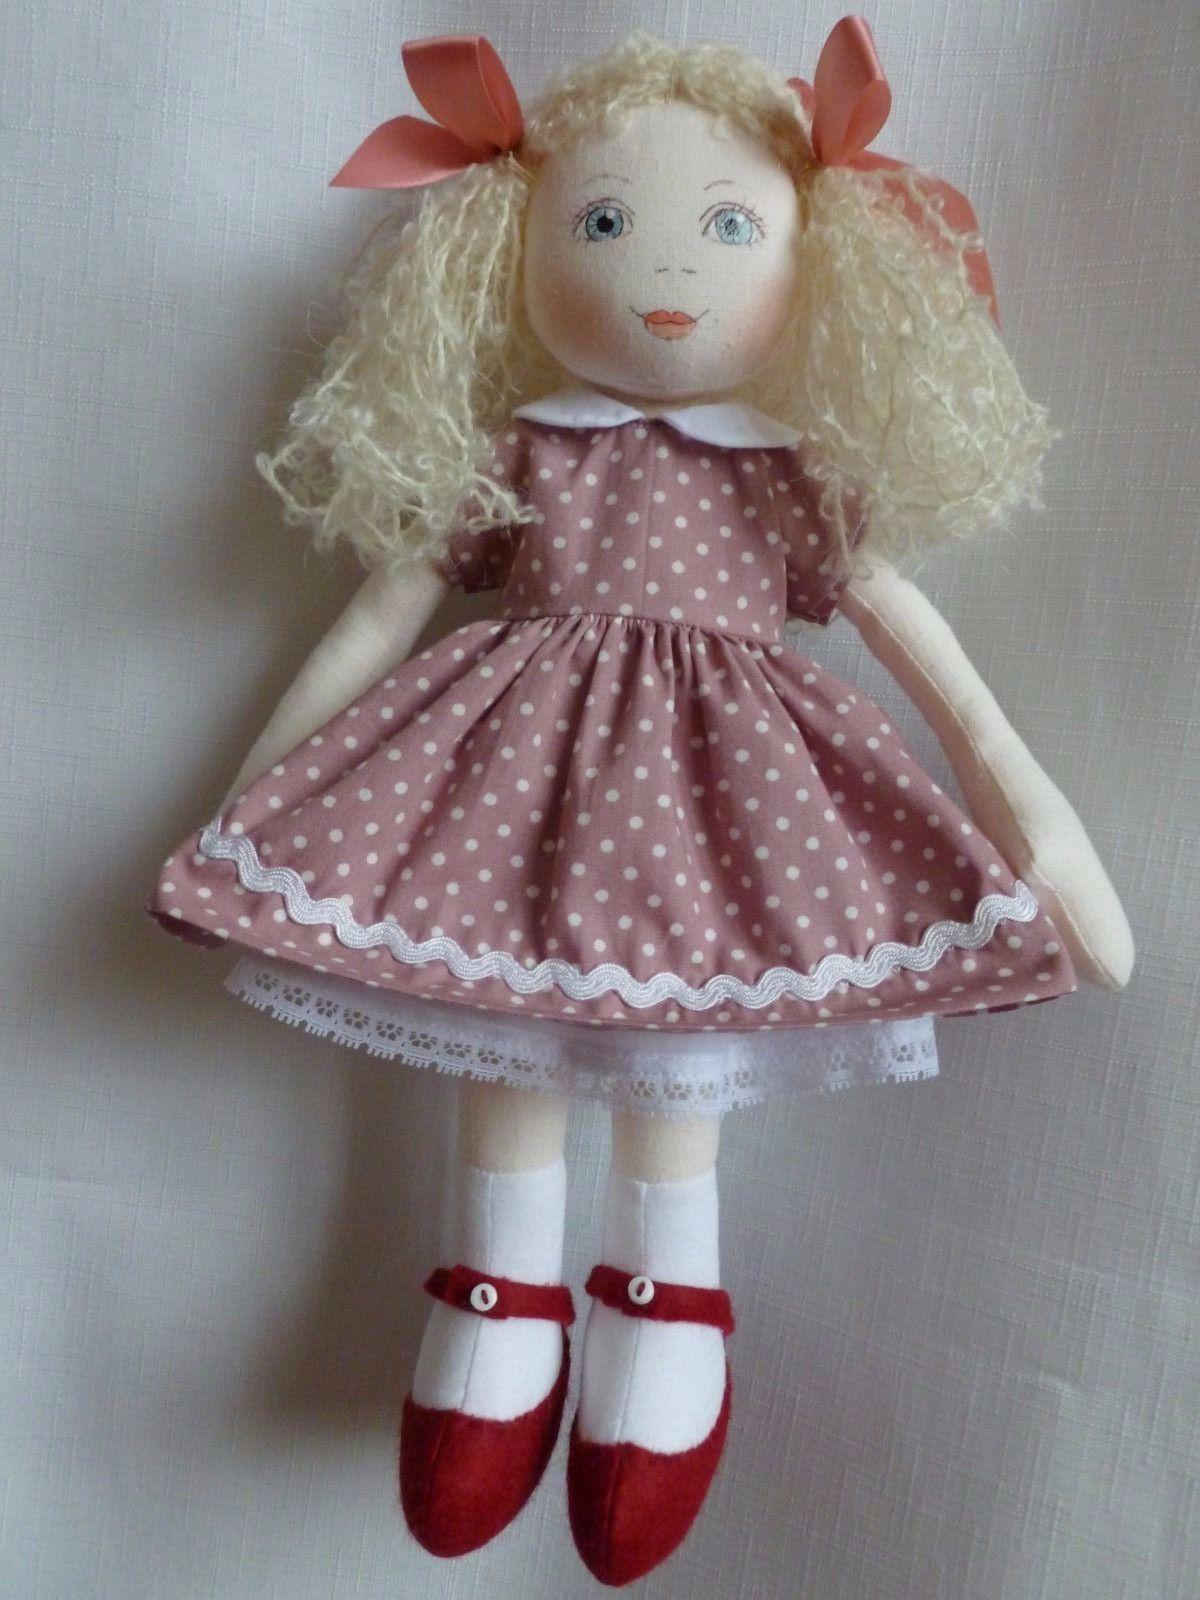 JENNY. A 13ins rag/cloth handmade ooak doll by Brenda Brightmore | eBay